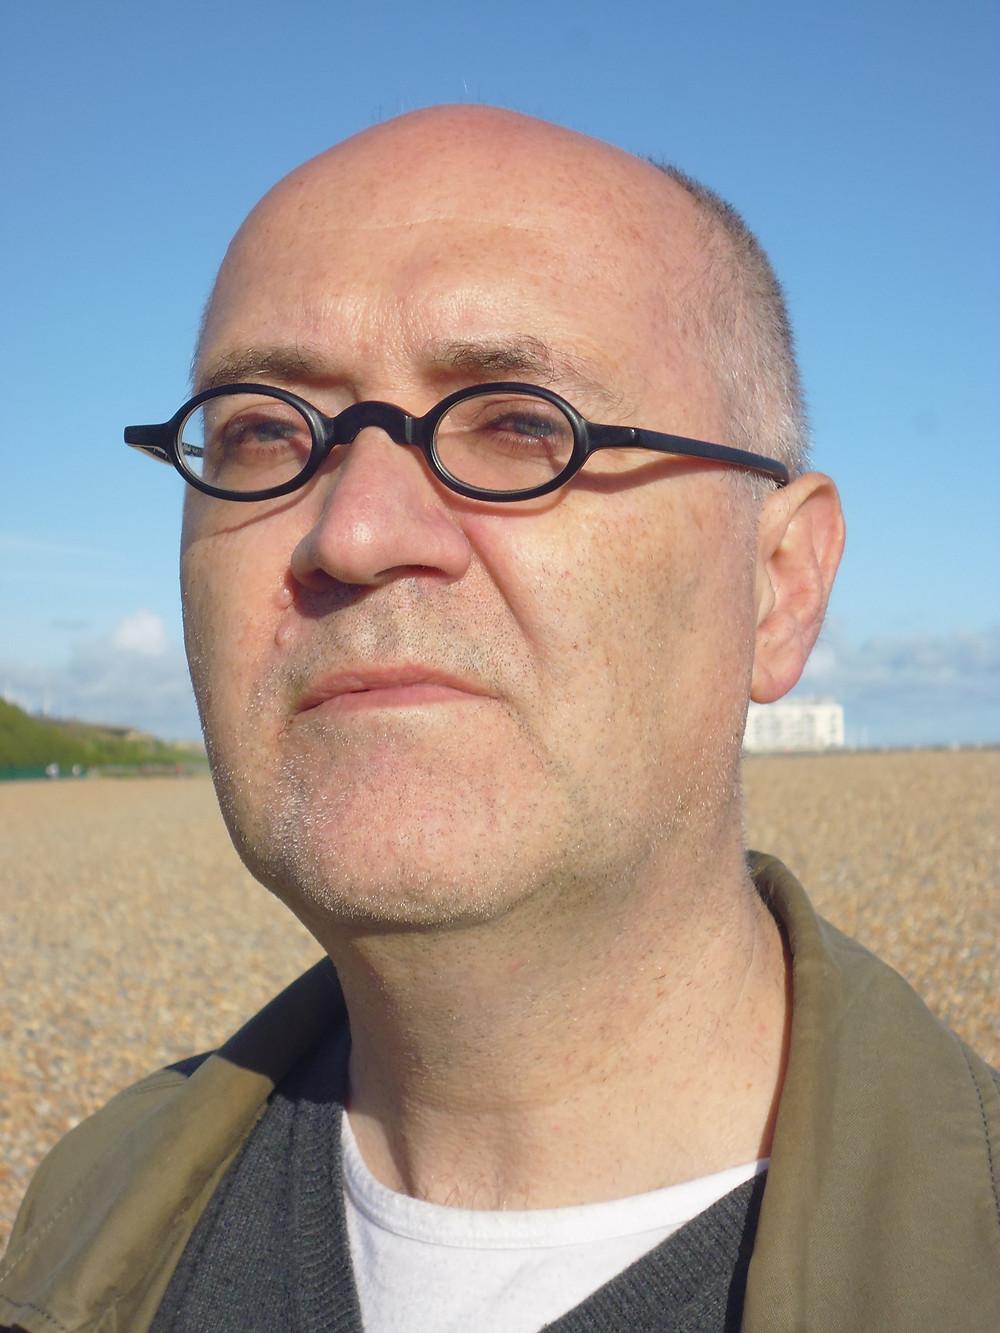 Martin Nathan, The Riff Raff